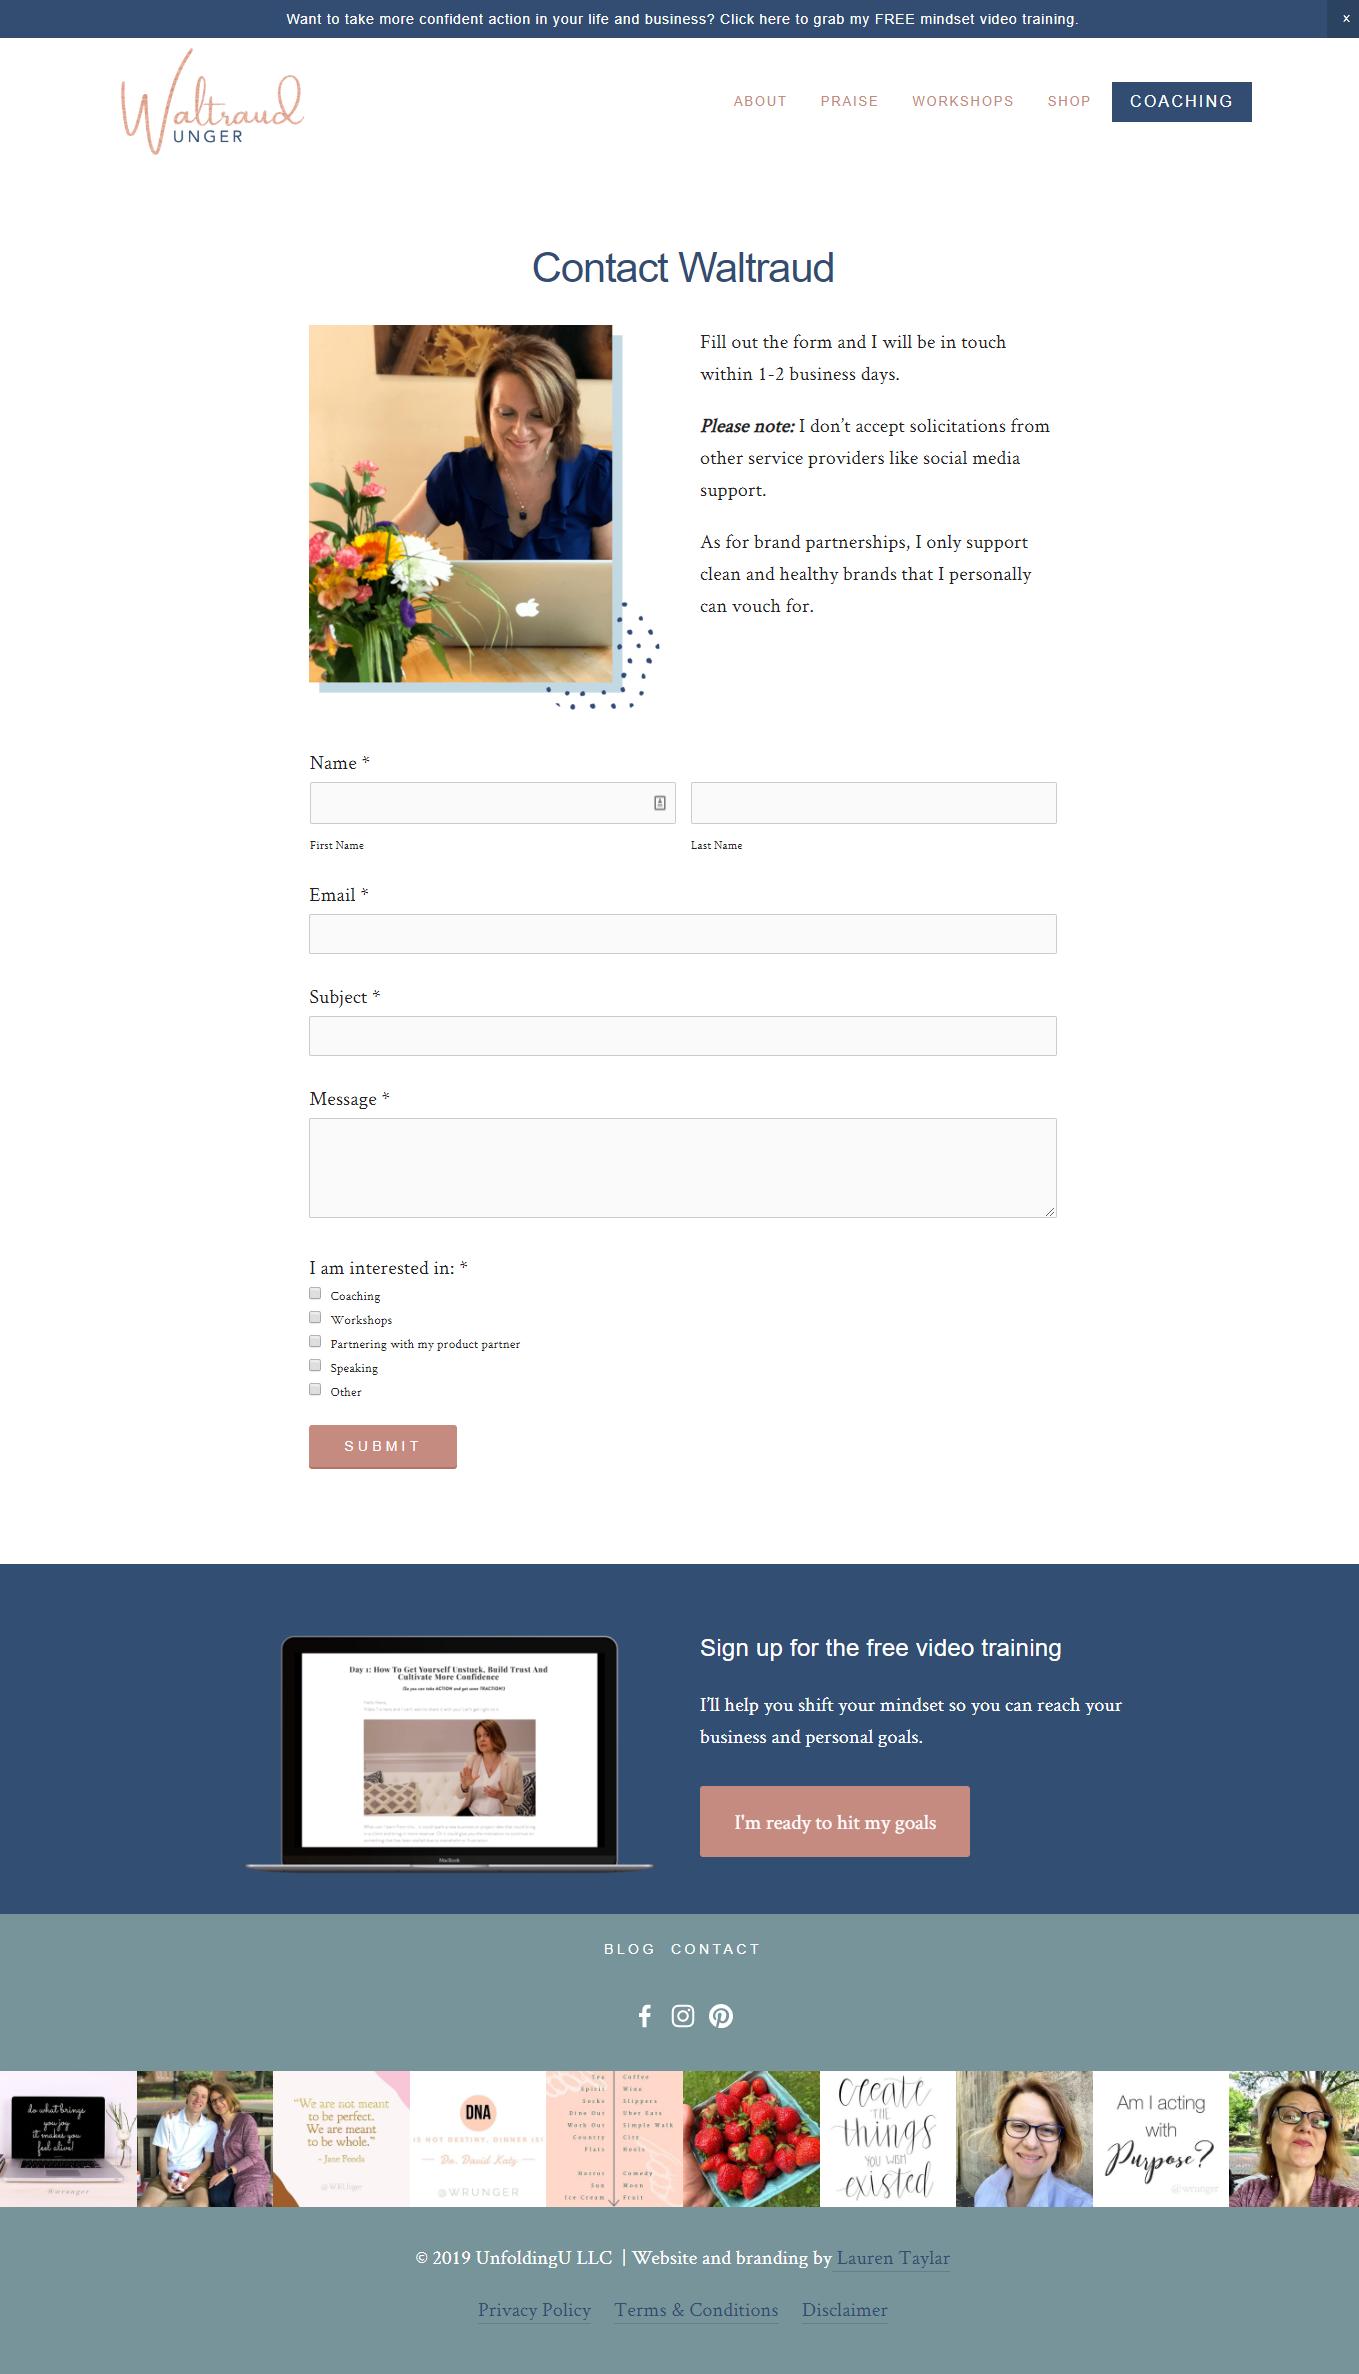 Lauren Taylar Squarespace Design Seo Strategy Small Business Website Design Squarespace Website Design Squarespace Design